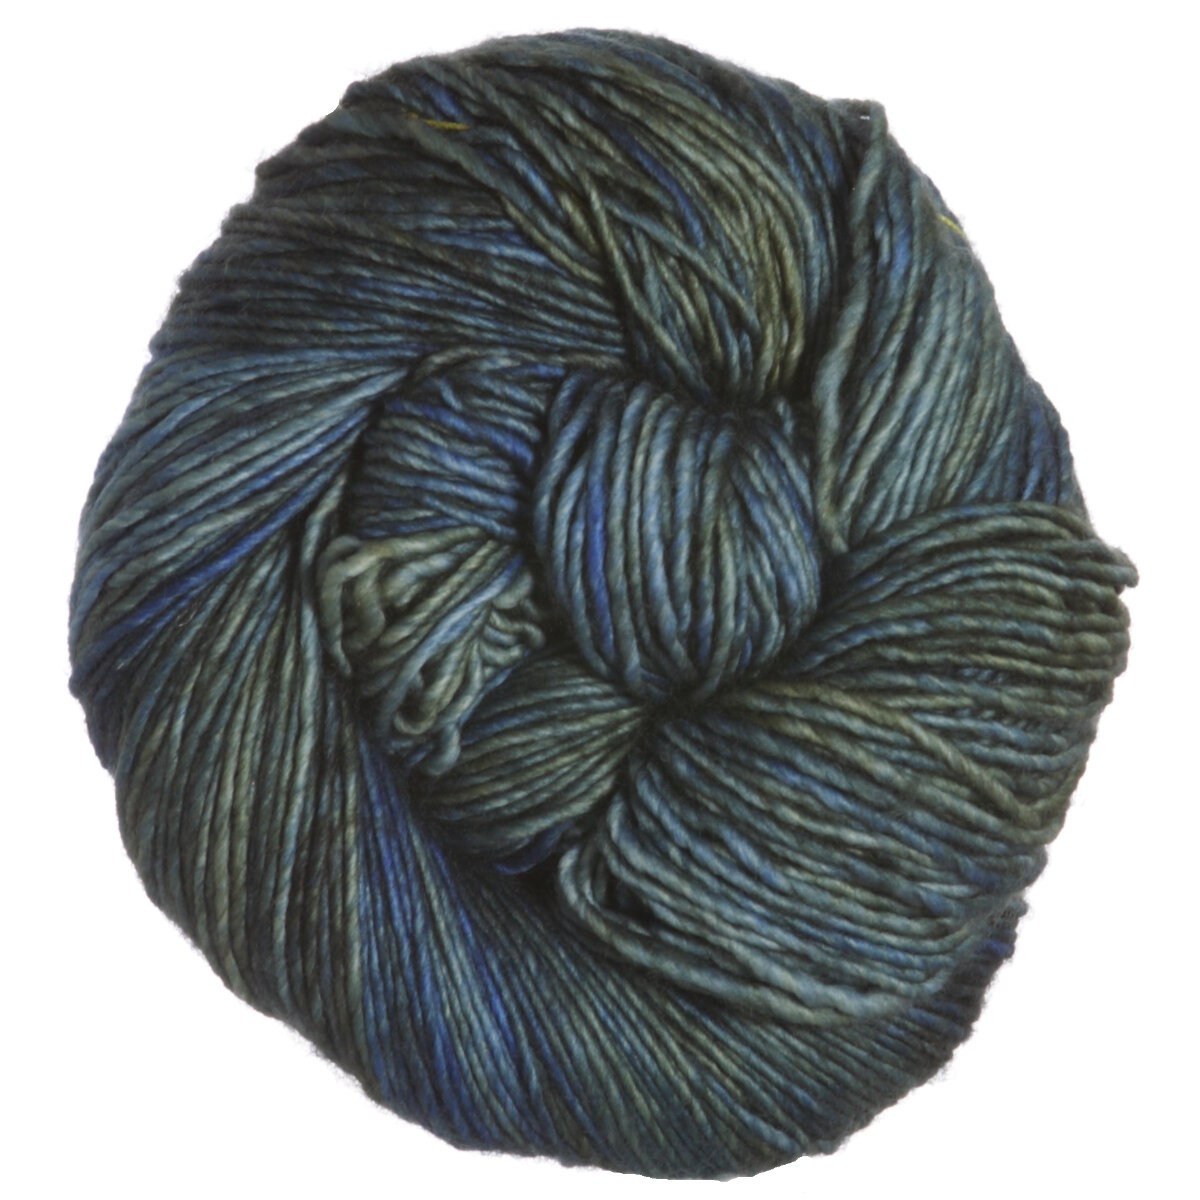 Madelinetosh Tosh Merino DK Yarn - Worn Denim at Jimmy Beans Wool